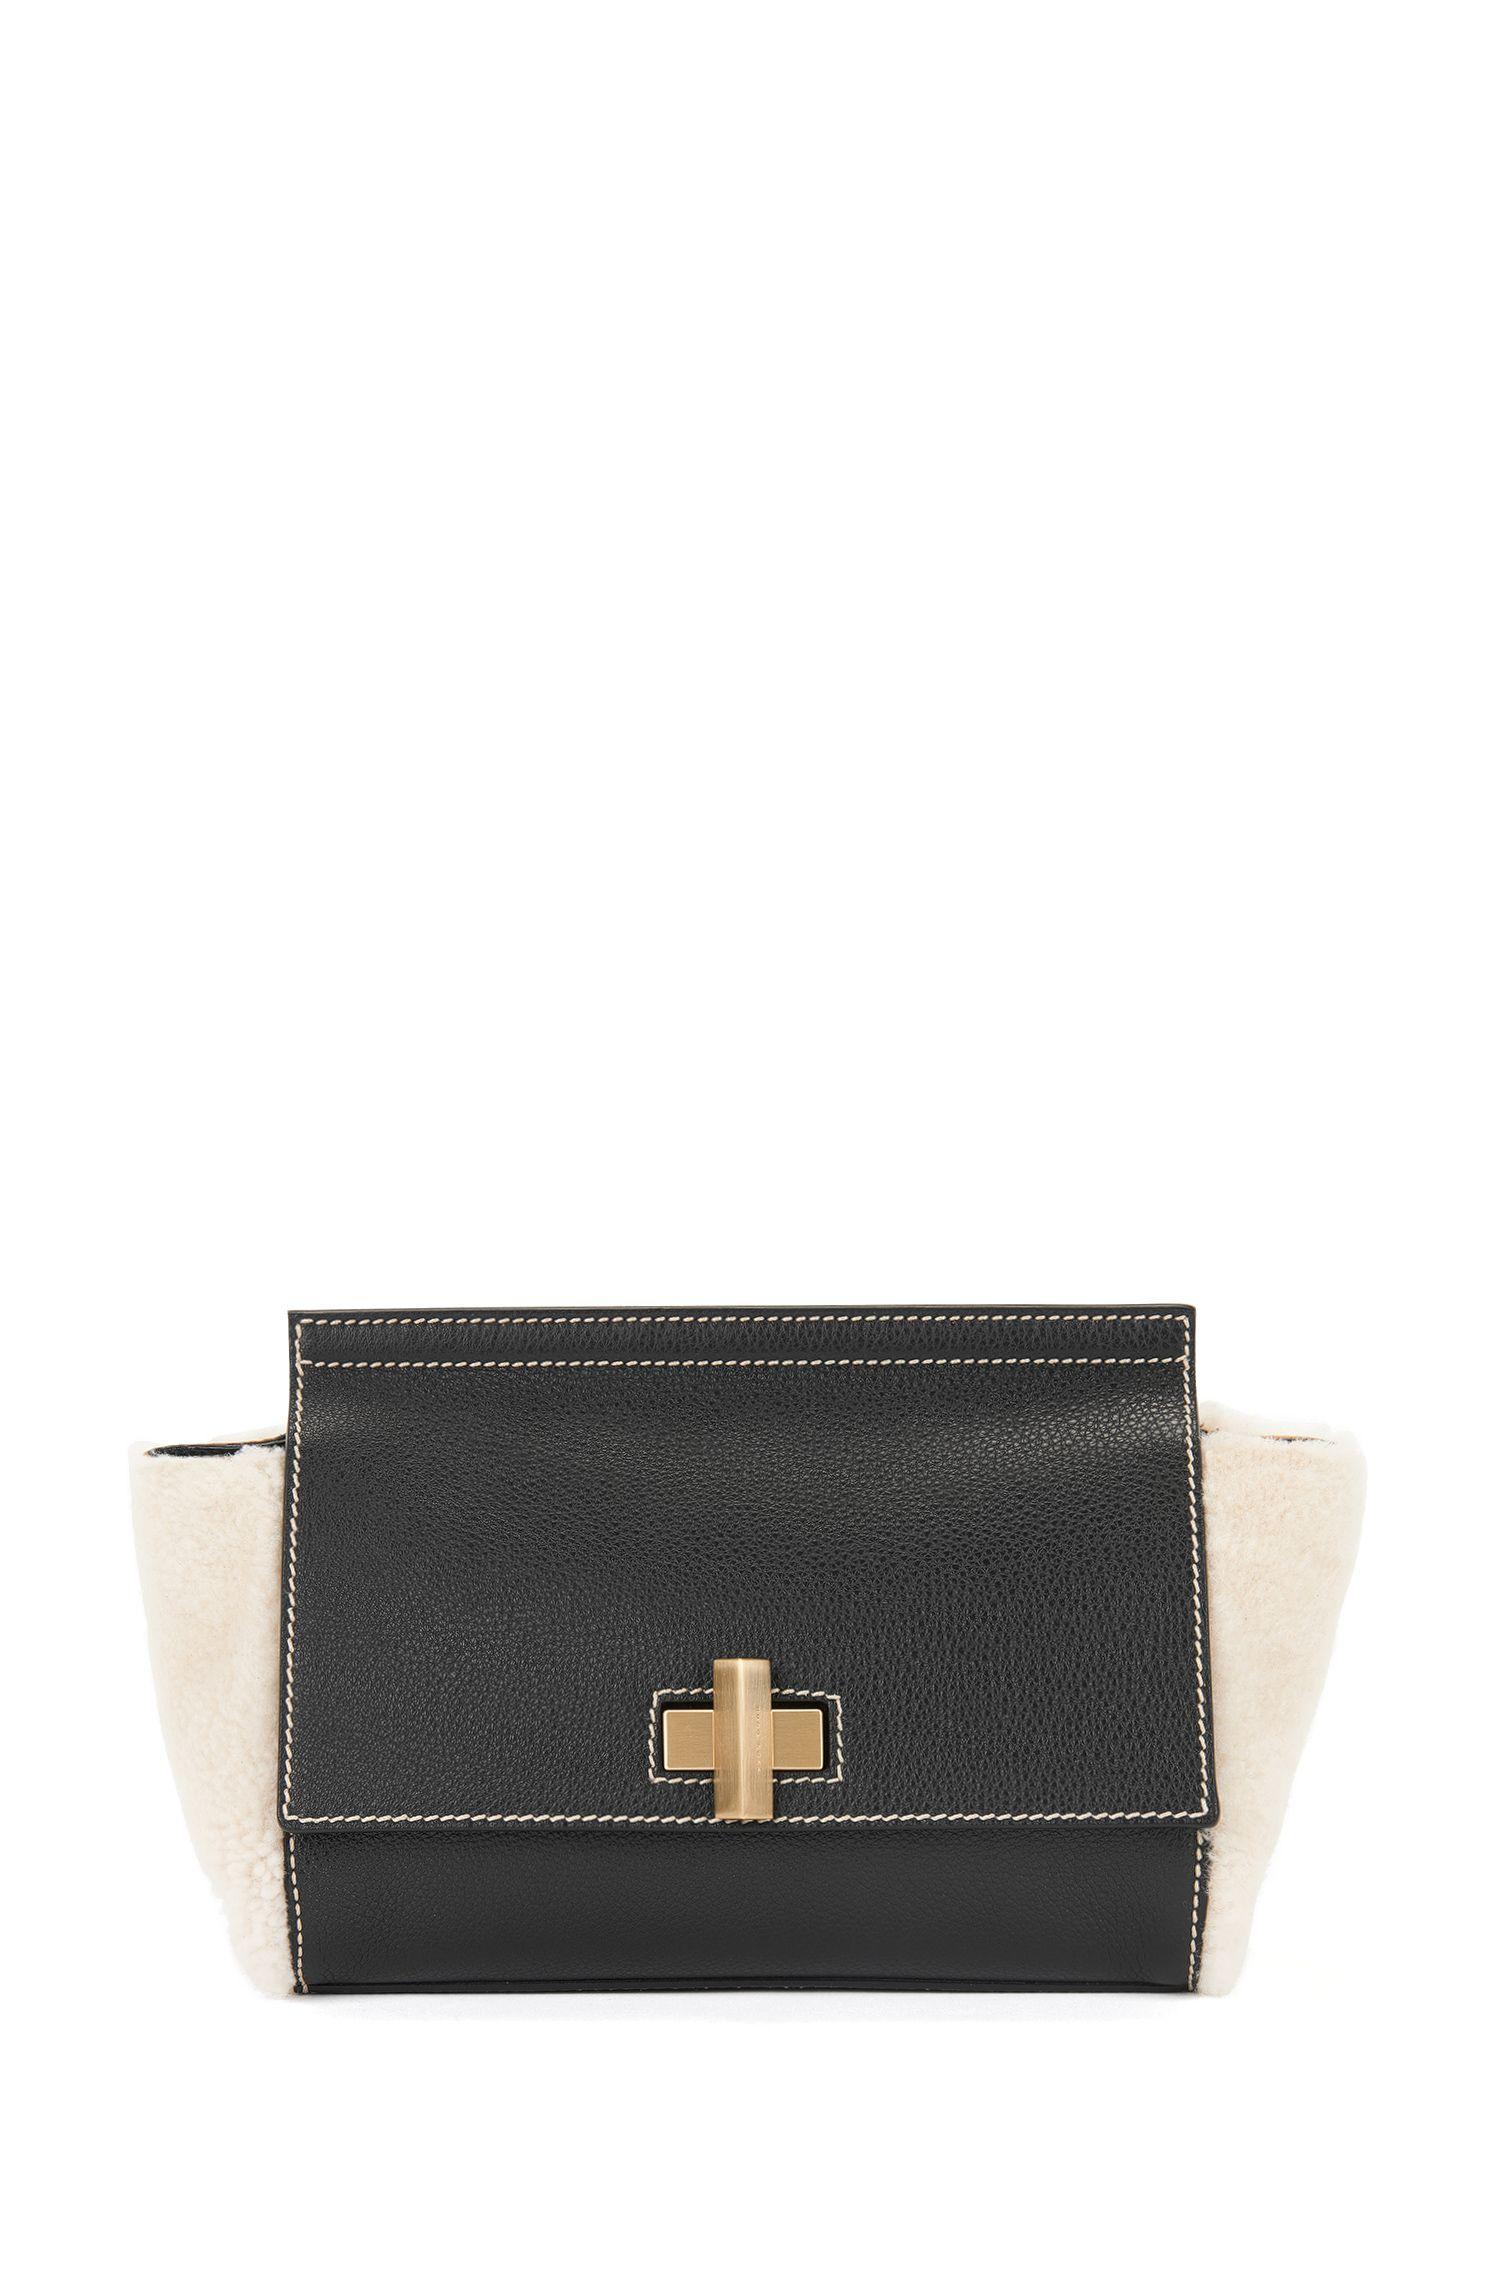 Shearling & Italian Leather Bag | BOSS Bespoke Soft CF